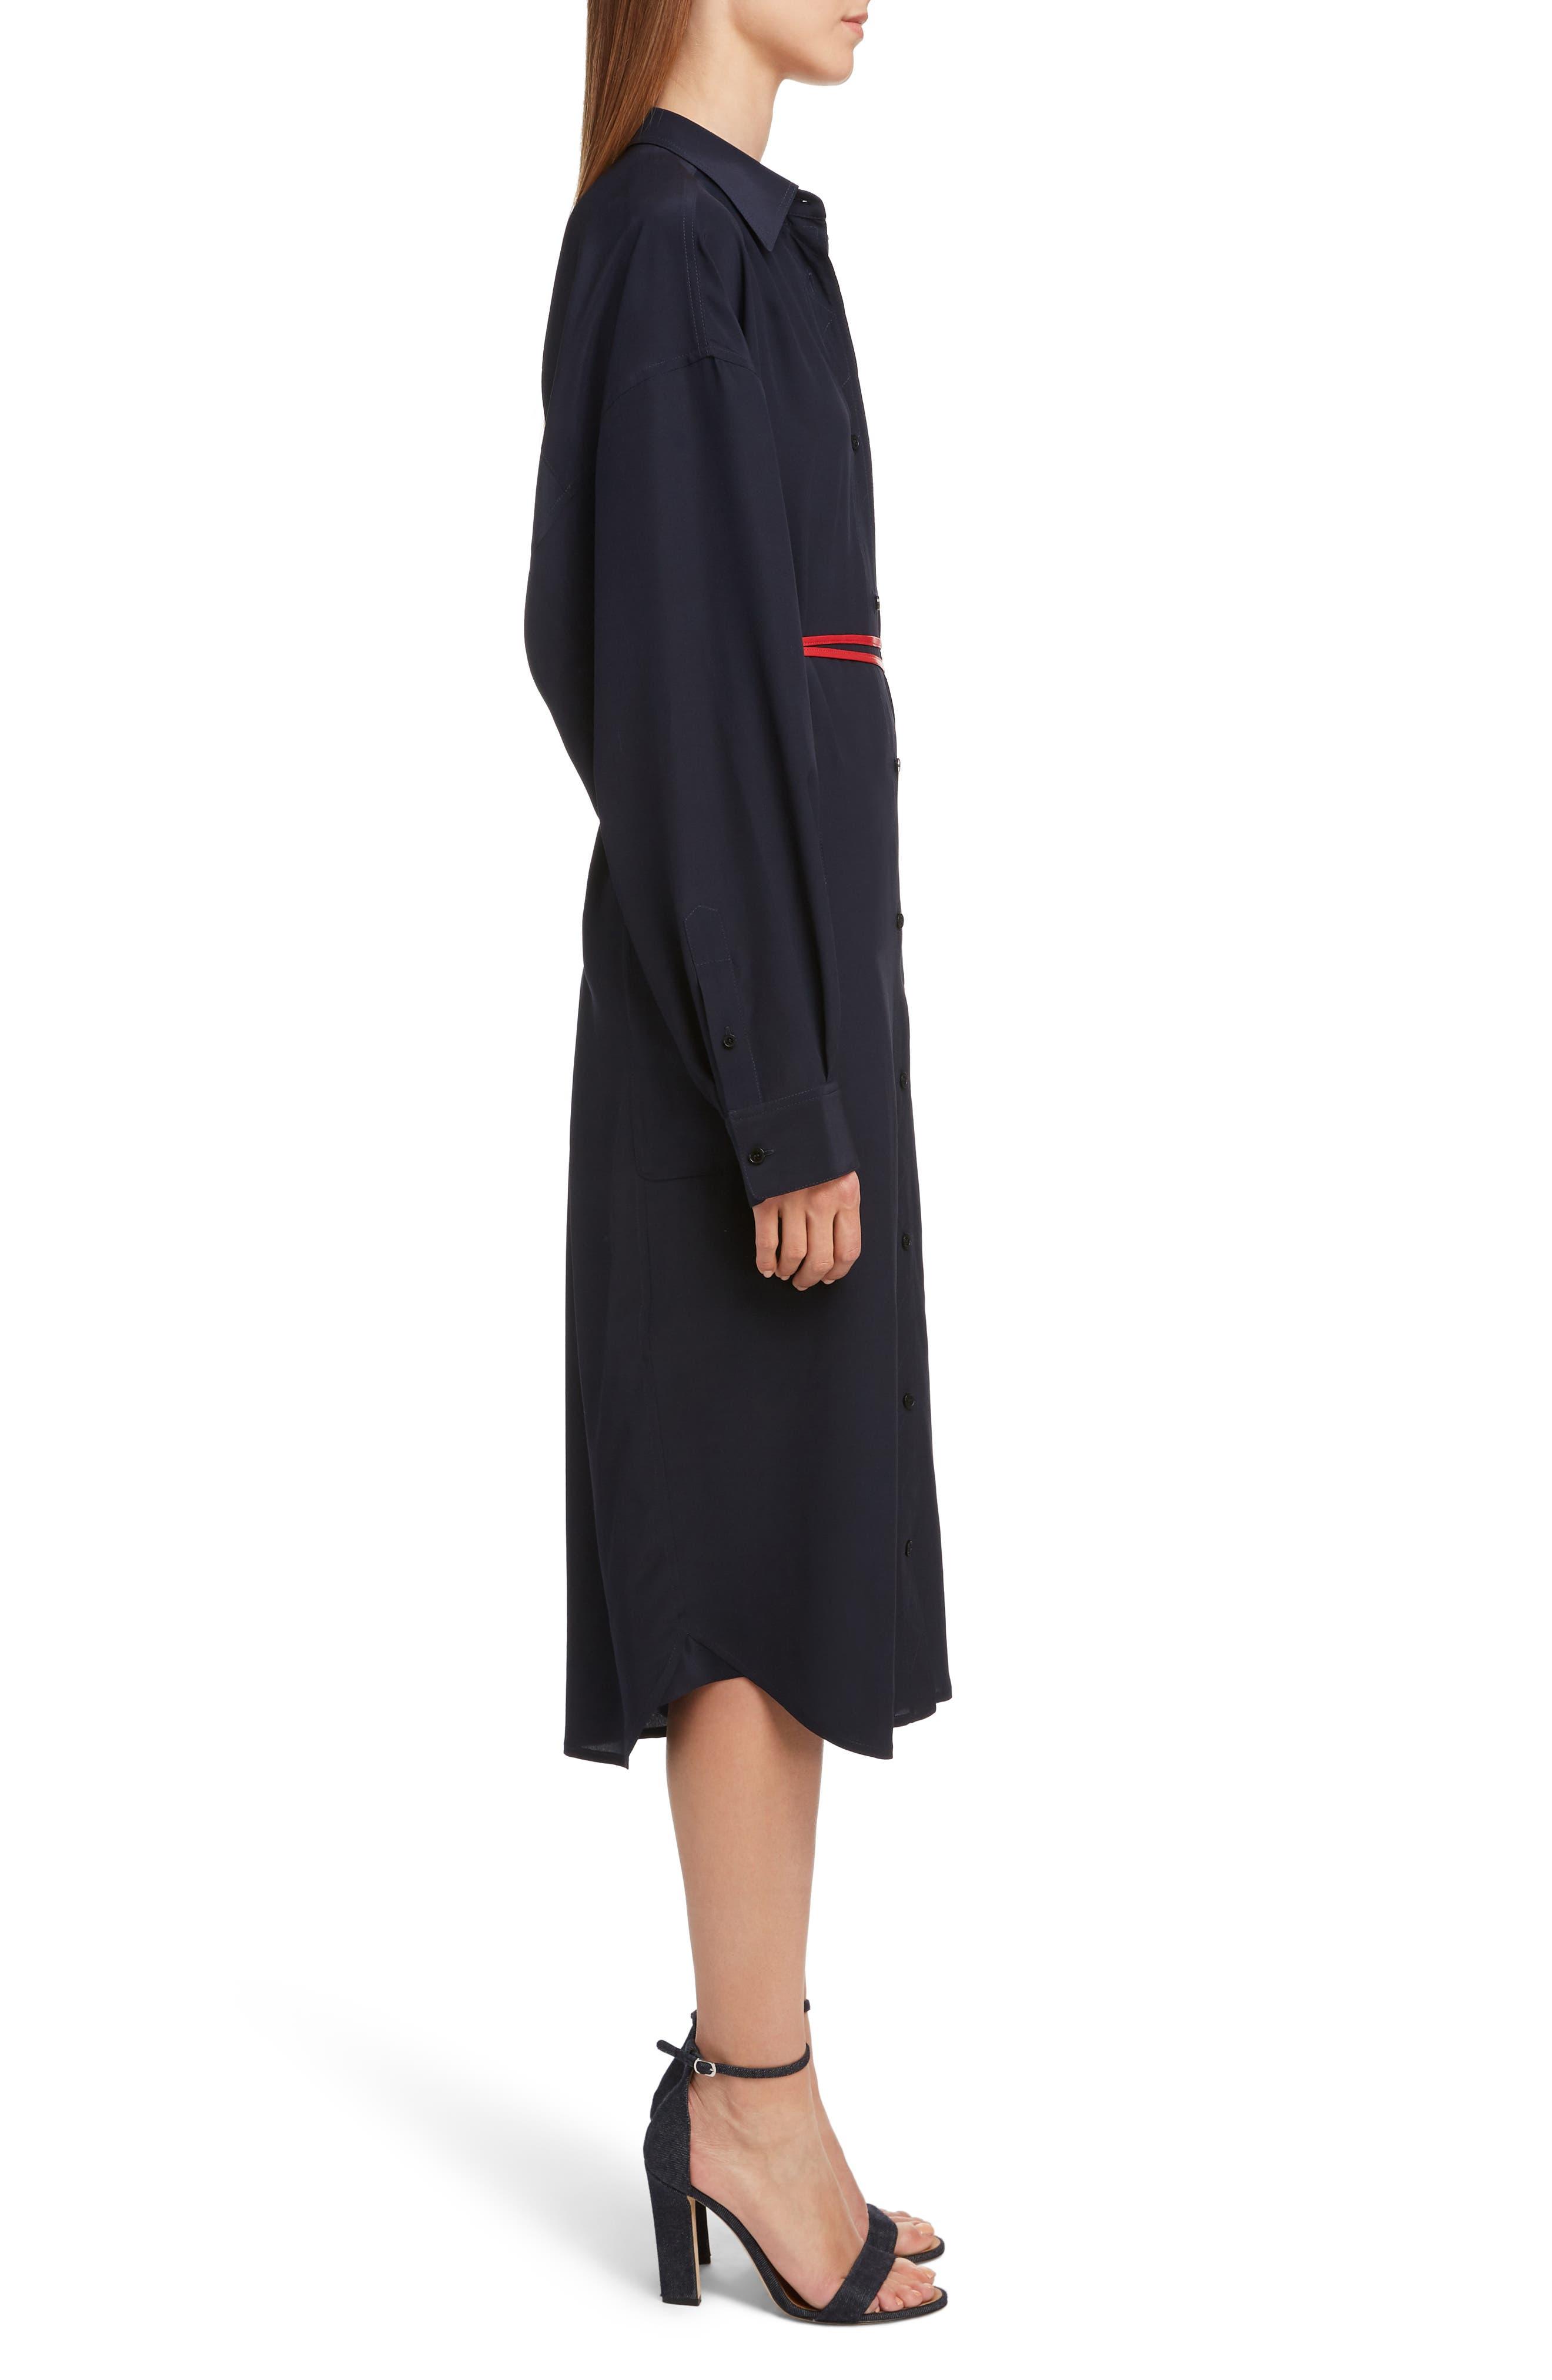 VICTORIA BECKHAM, Belted Silk Shirtdress, Alternate thumbnail 3, color, NAVY/ RED